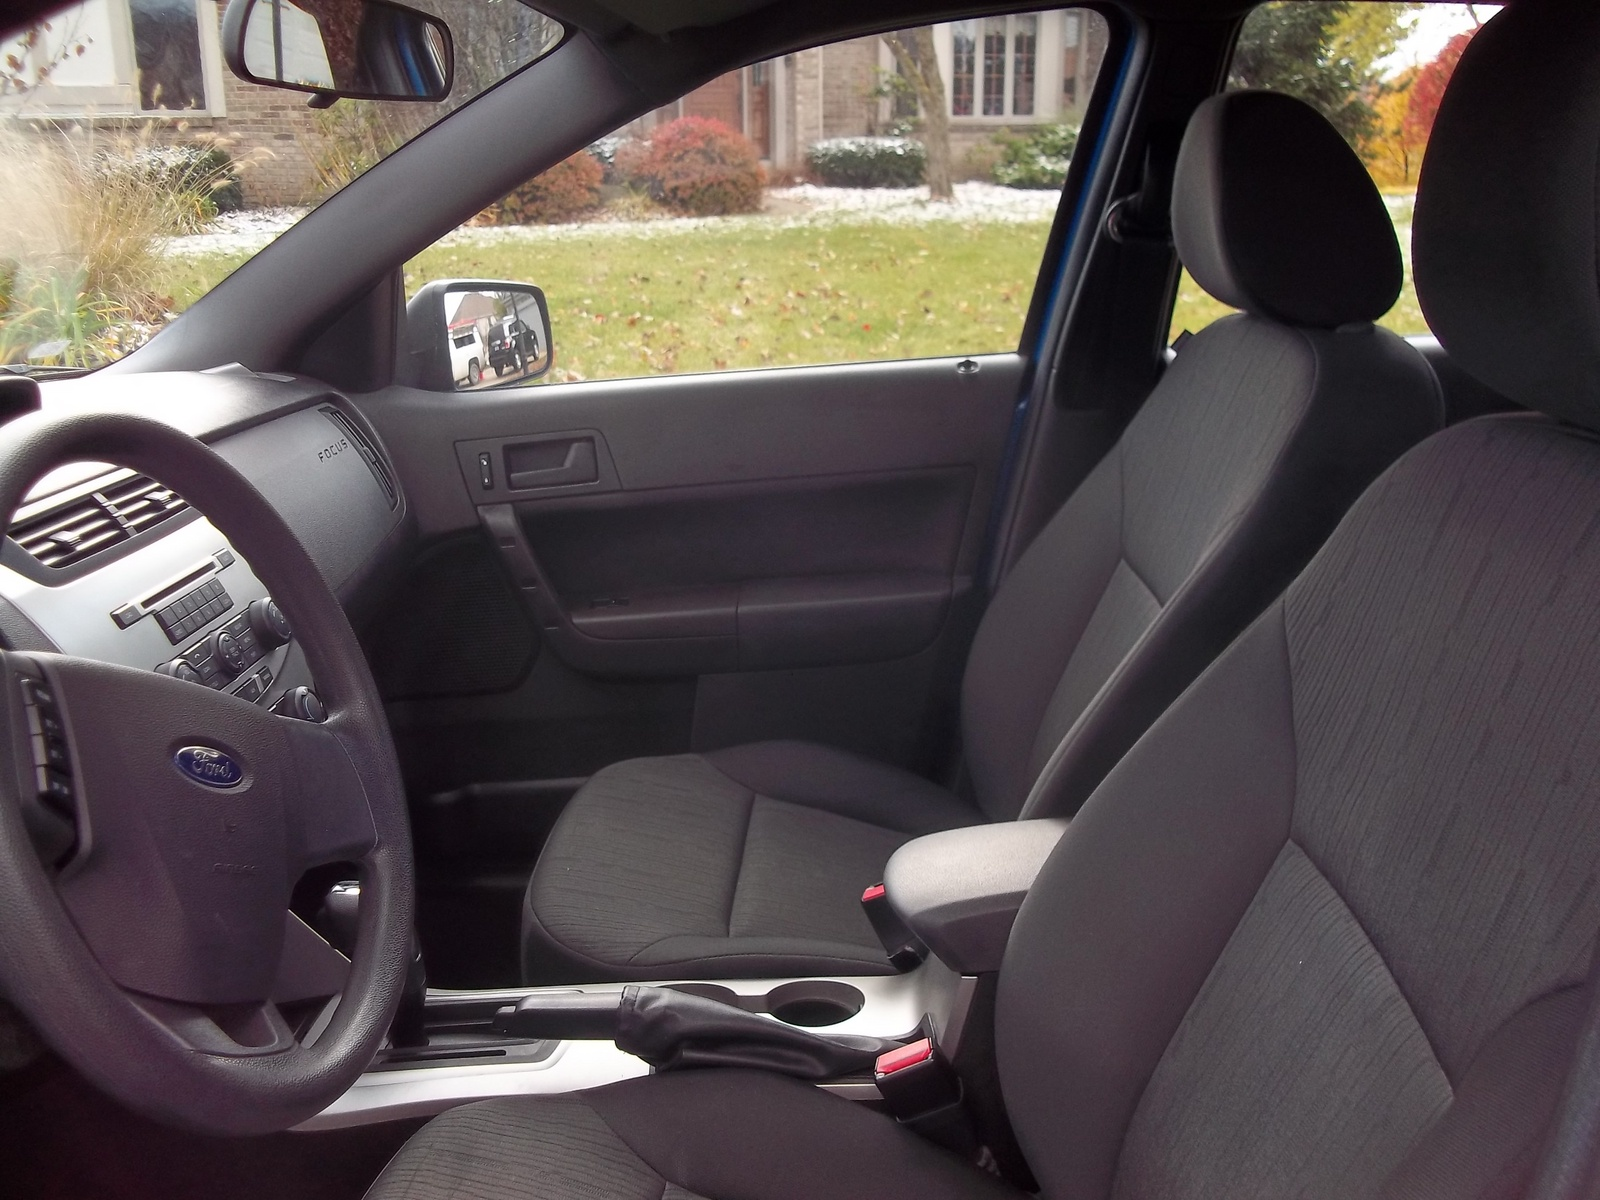 2010 Ford Focus